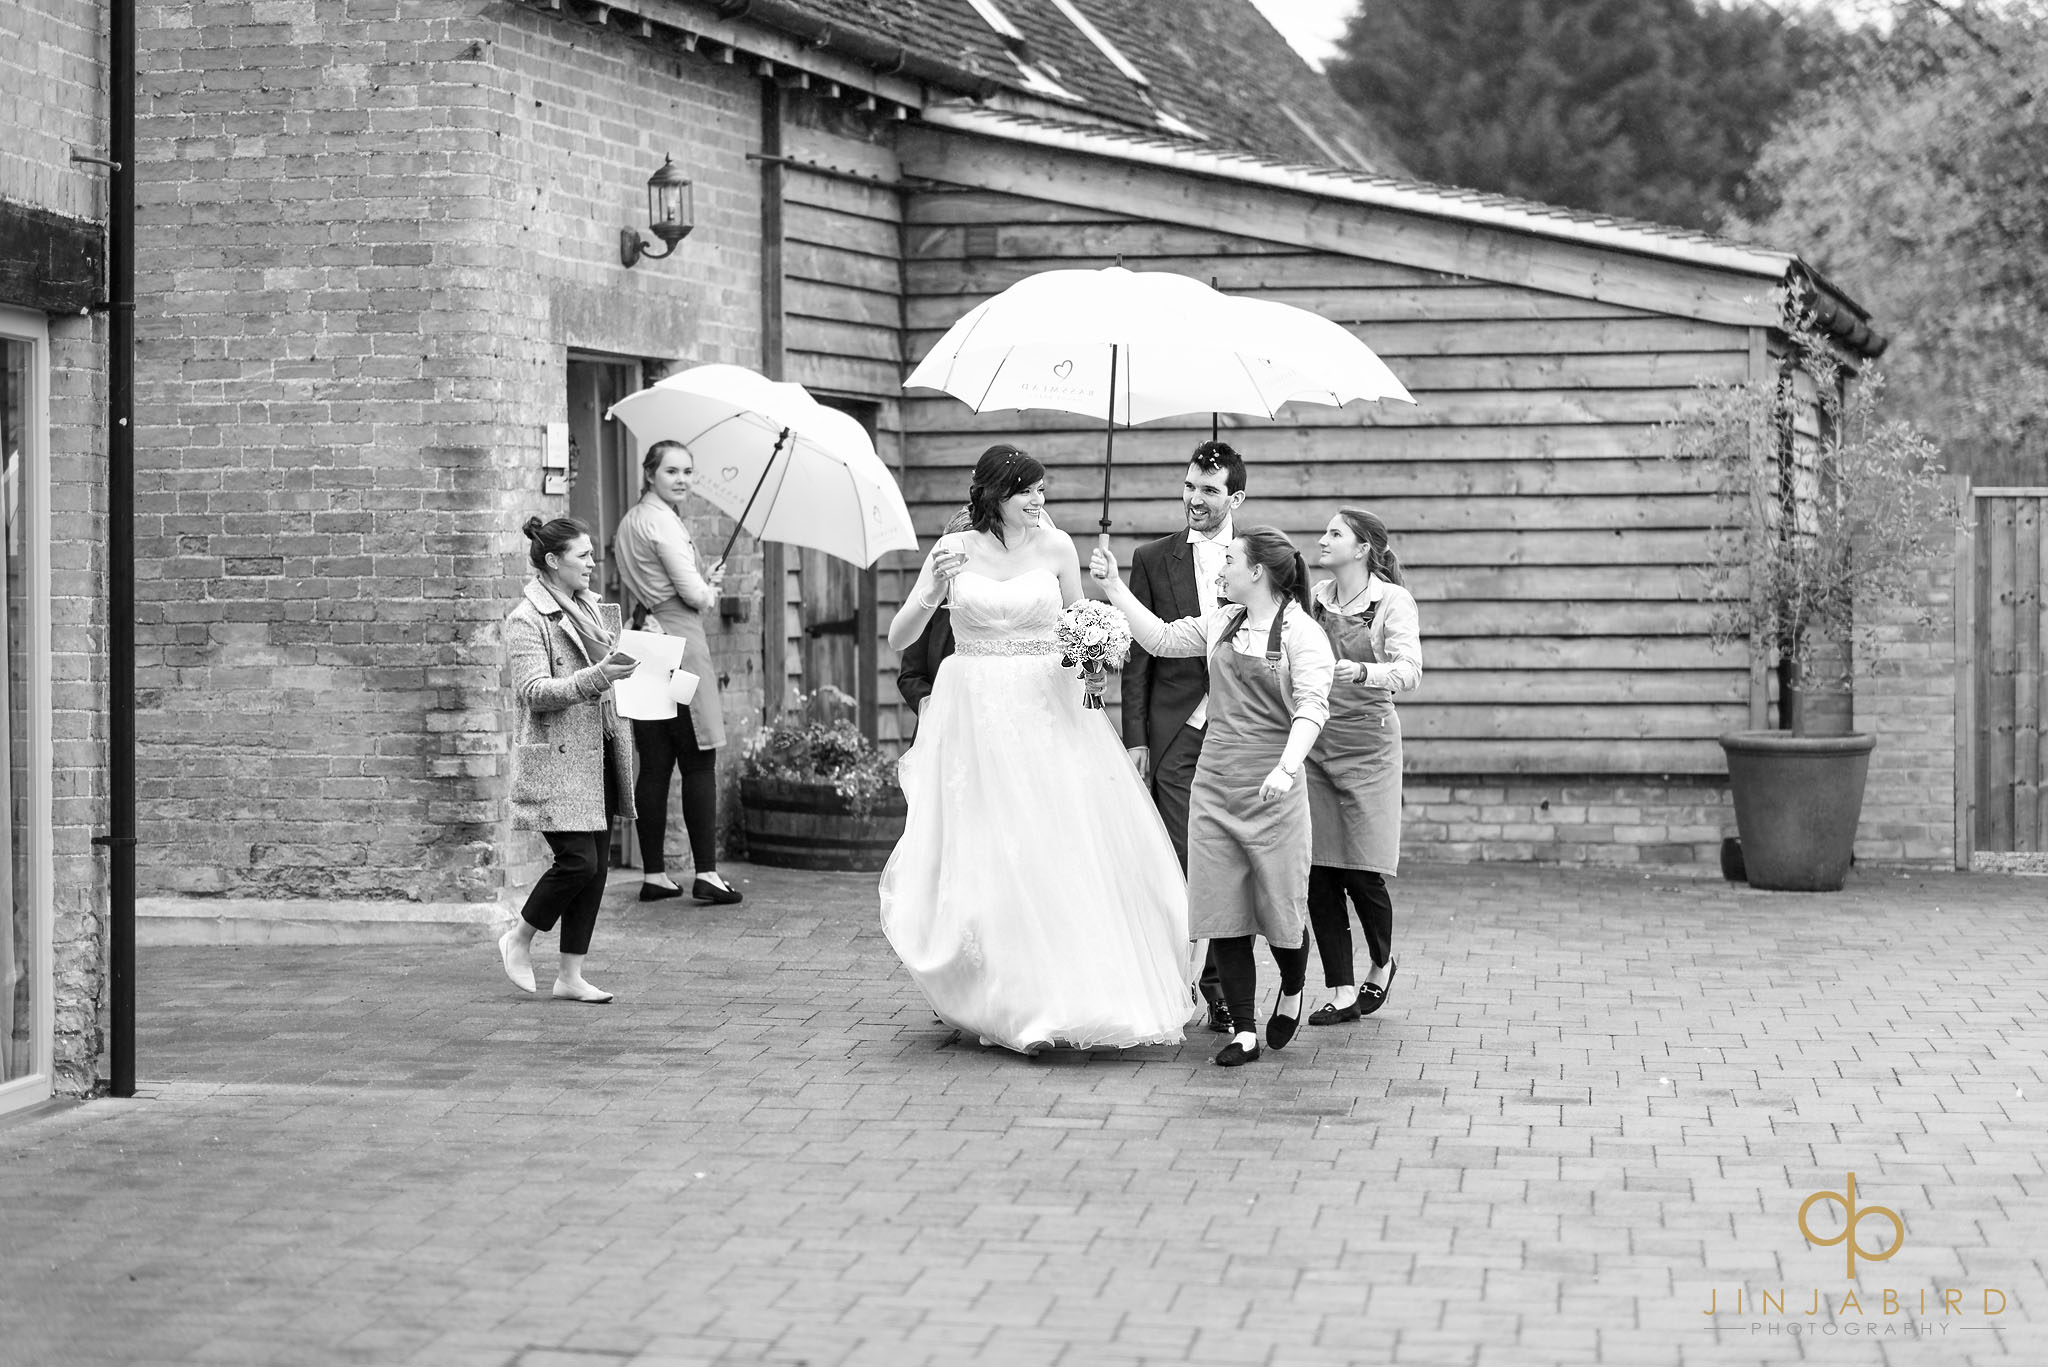 bride and groom walking in rain with umbrellas bassmead manor